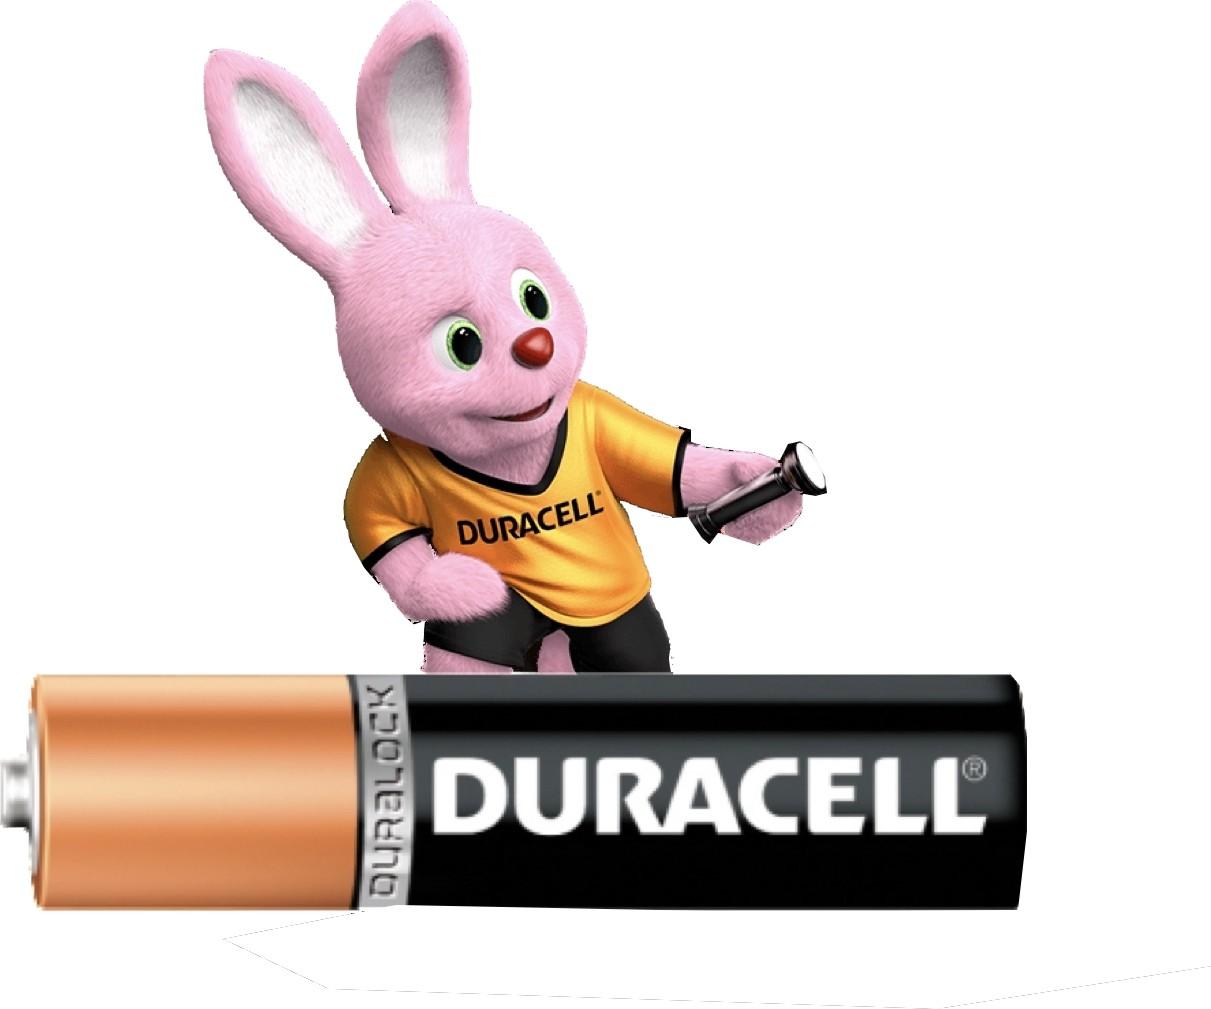 45 Duracell